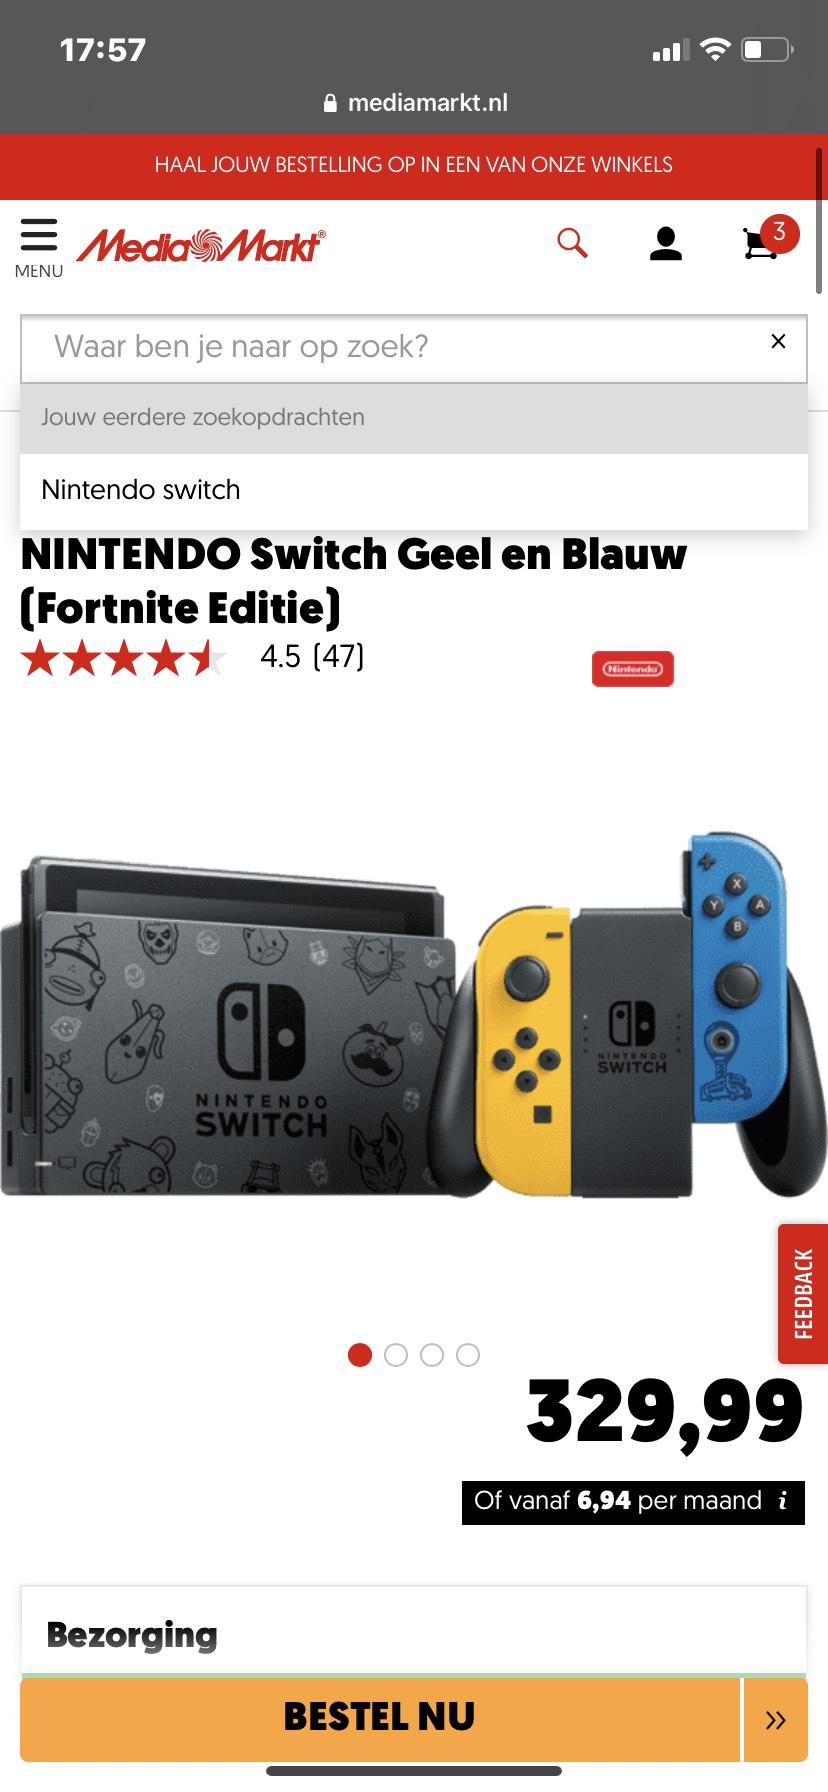 Nintendo switch fortnite editie @Mediamarkt